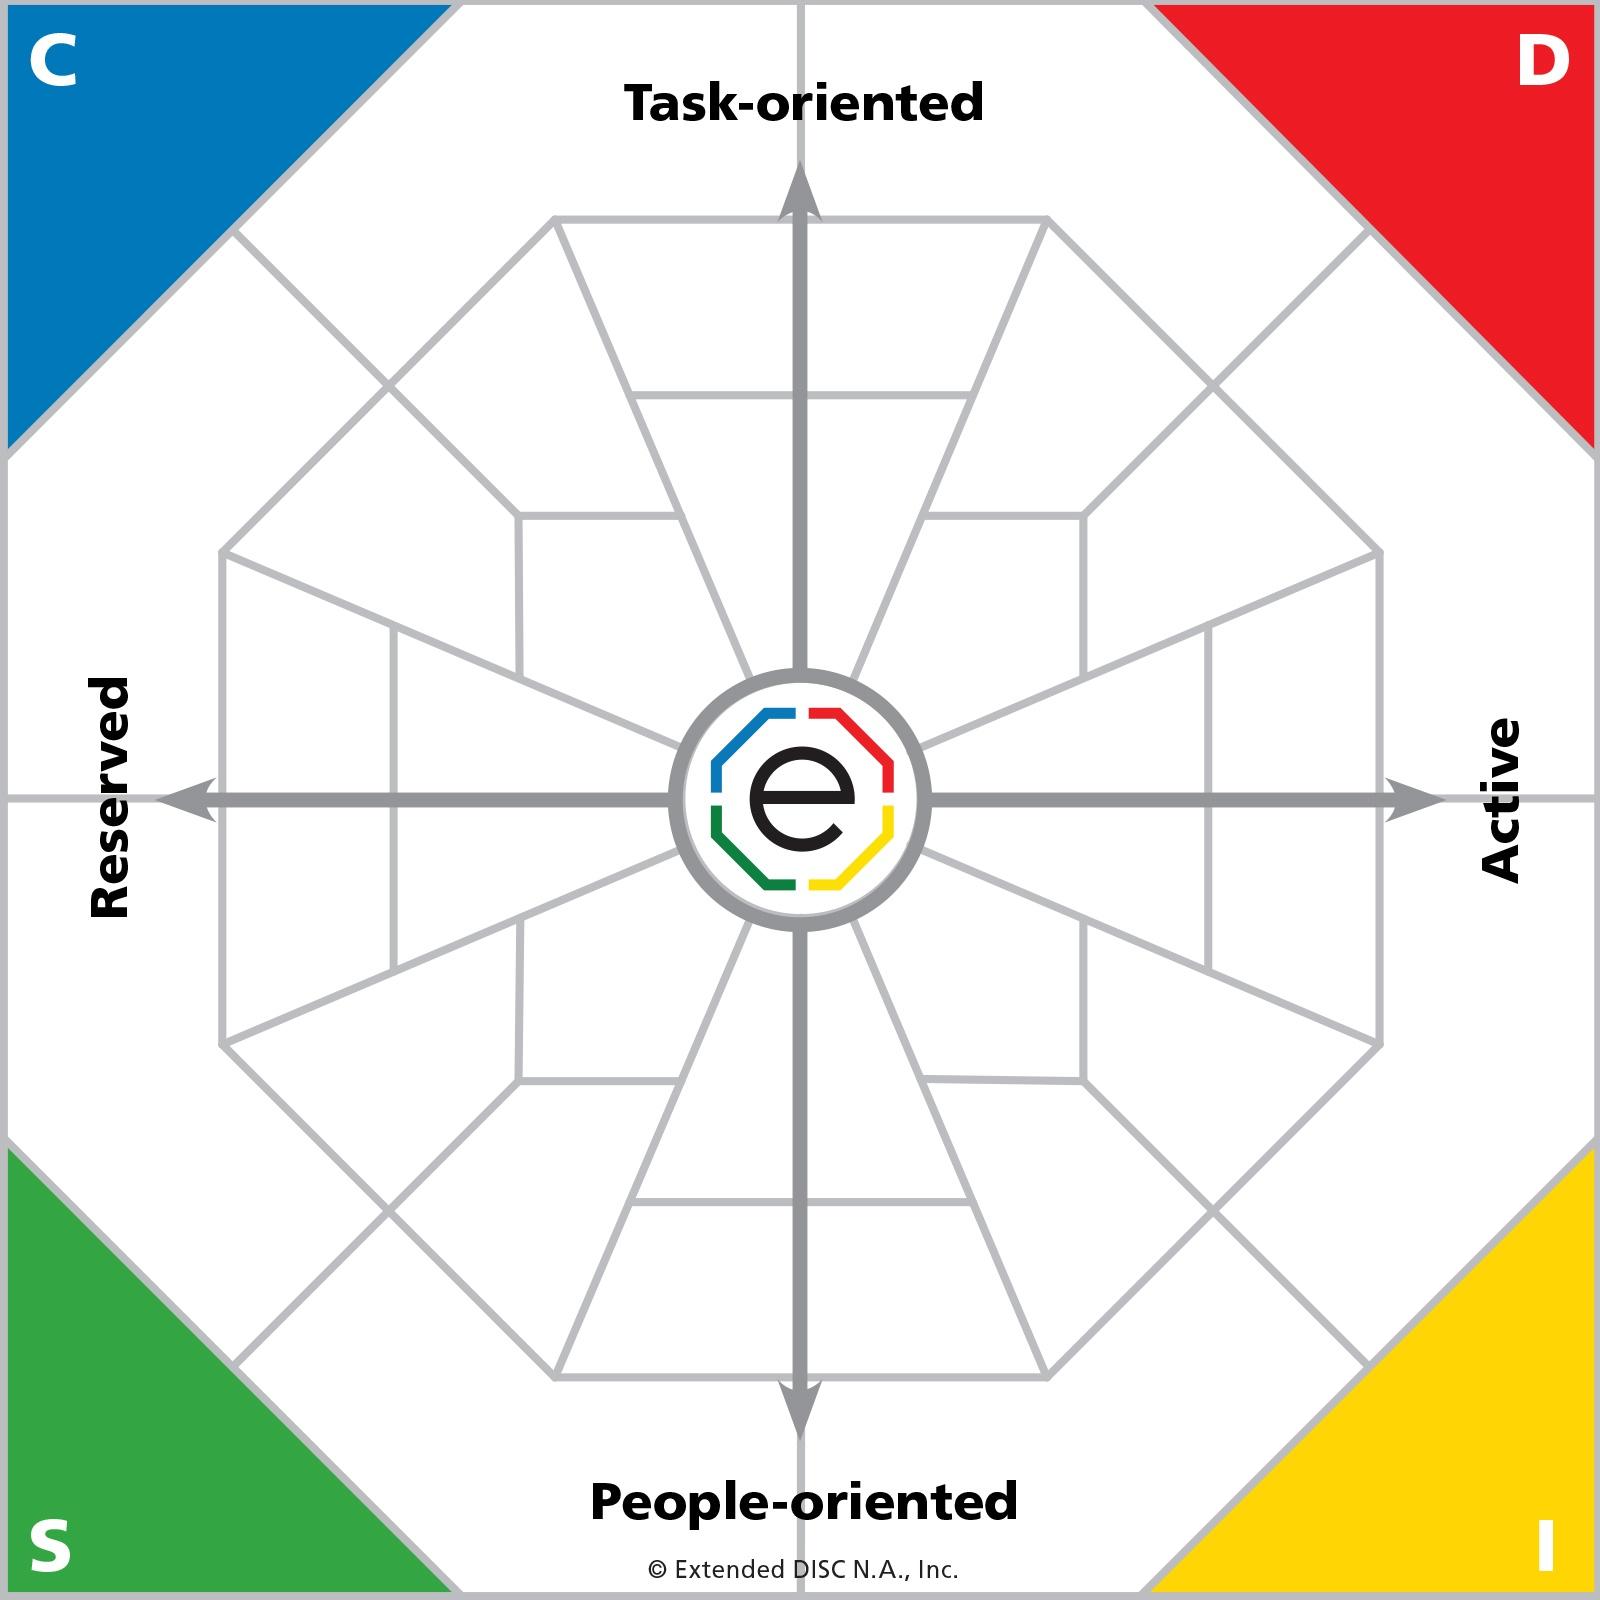 Extended DISC Diamond+4 Behavioral Dimensions